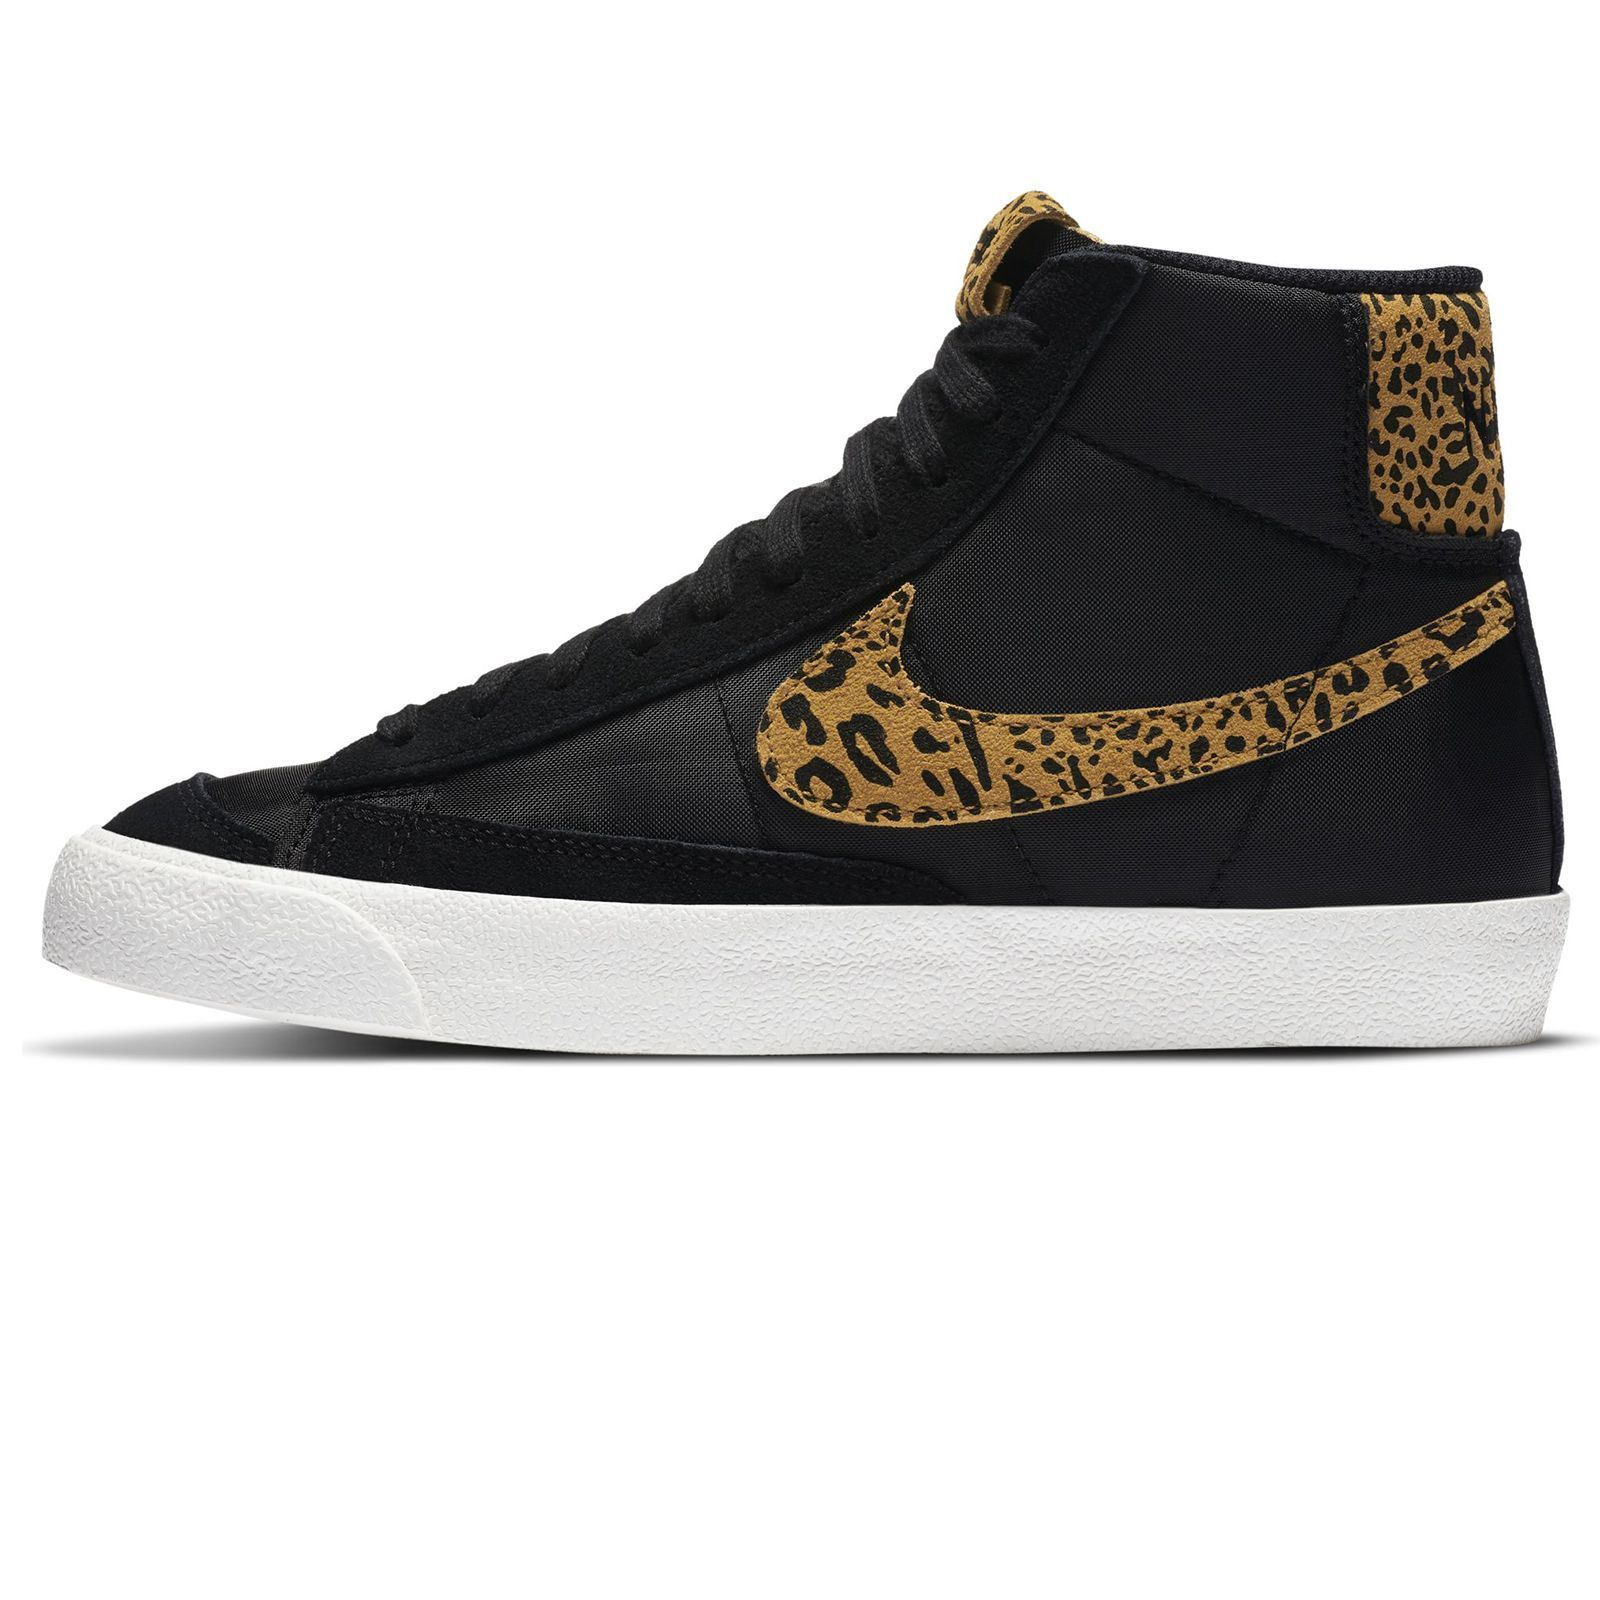 Nike Blazer Mid '77 WMNS Leopard